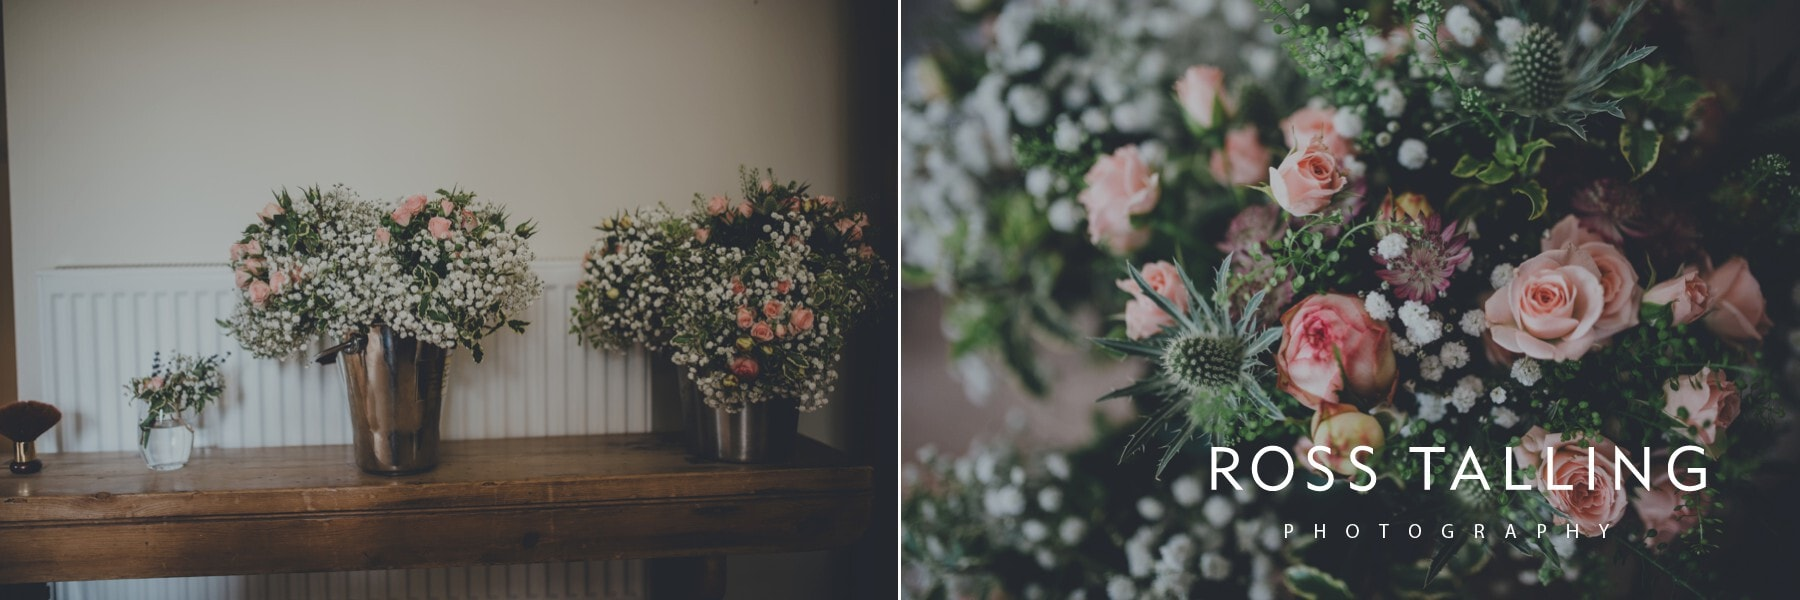 Sarah & Dean's Wedding Photography Cornwall_0012